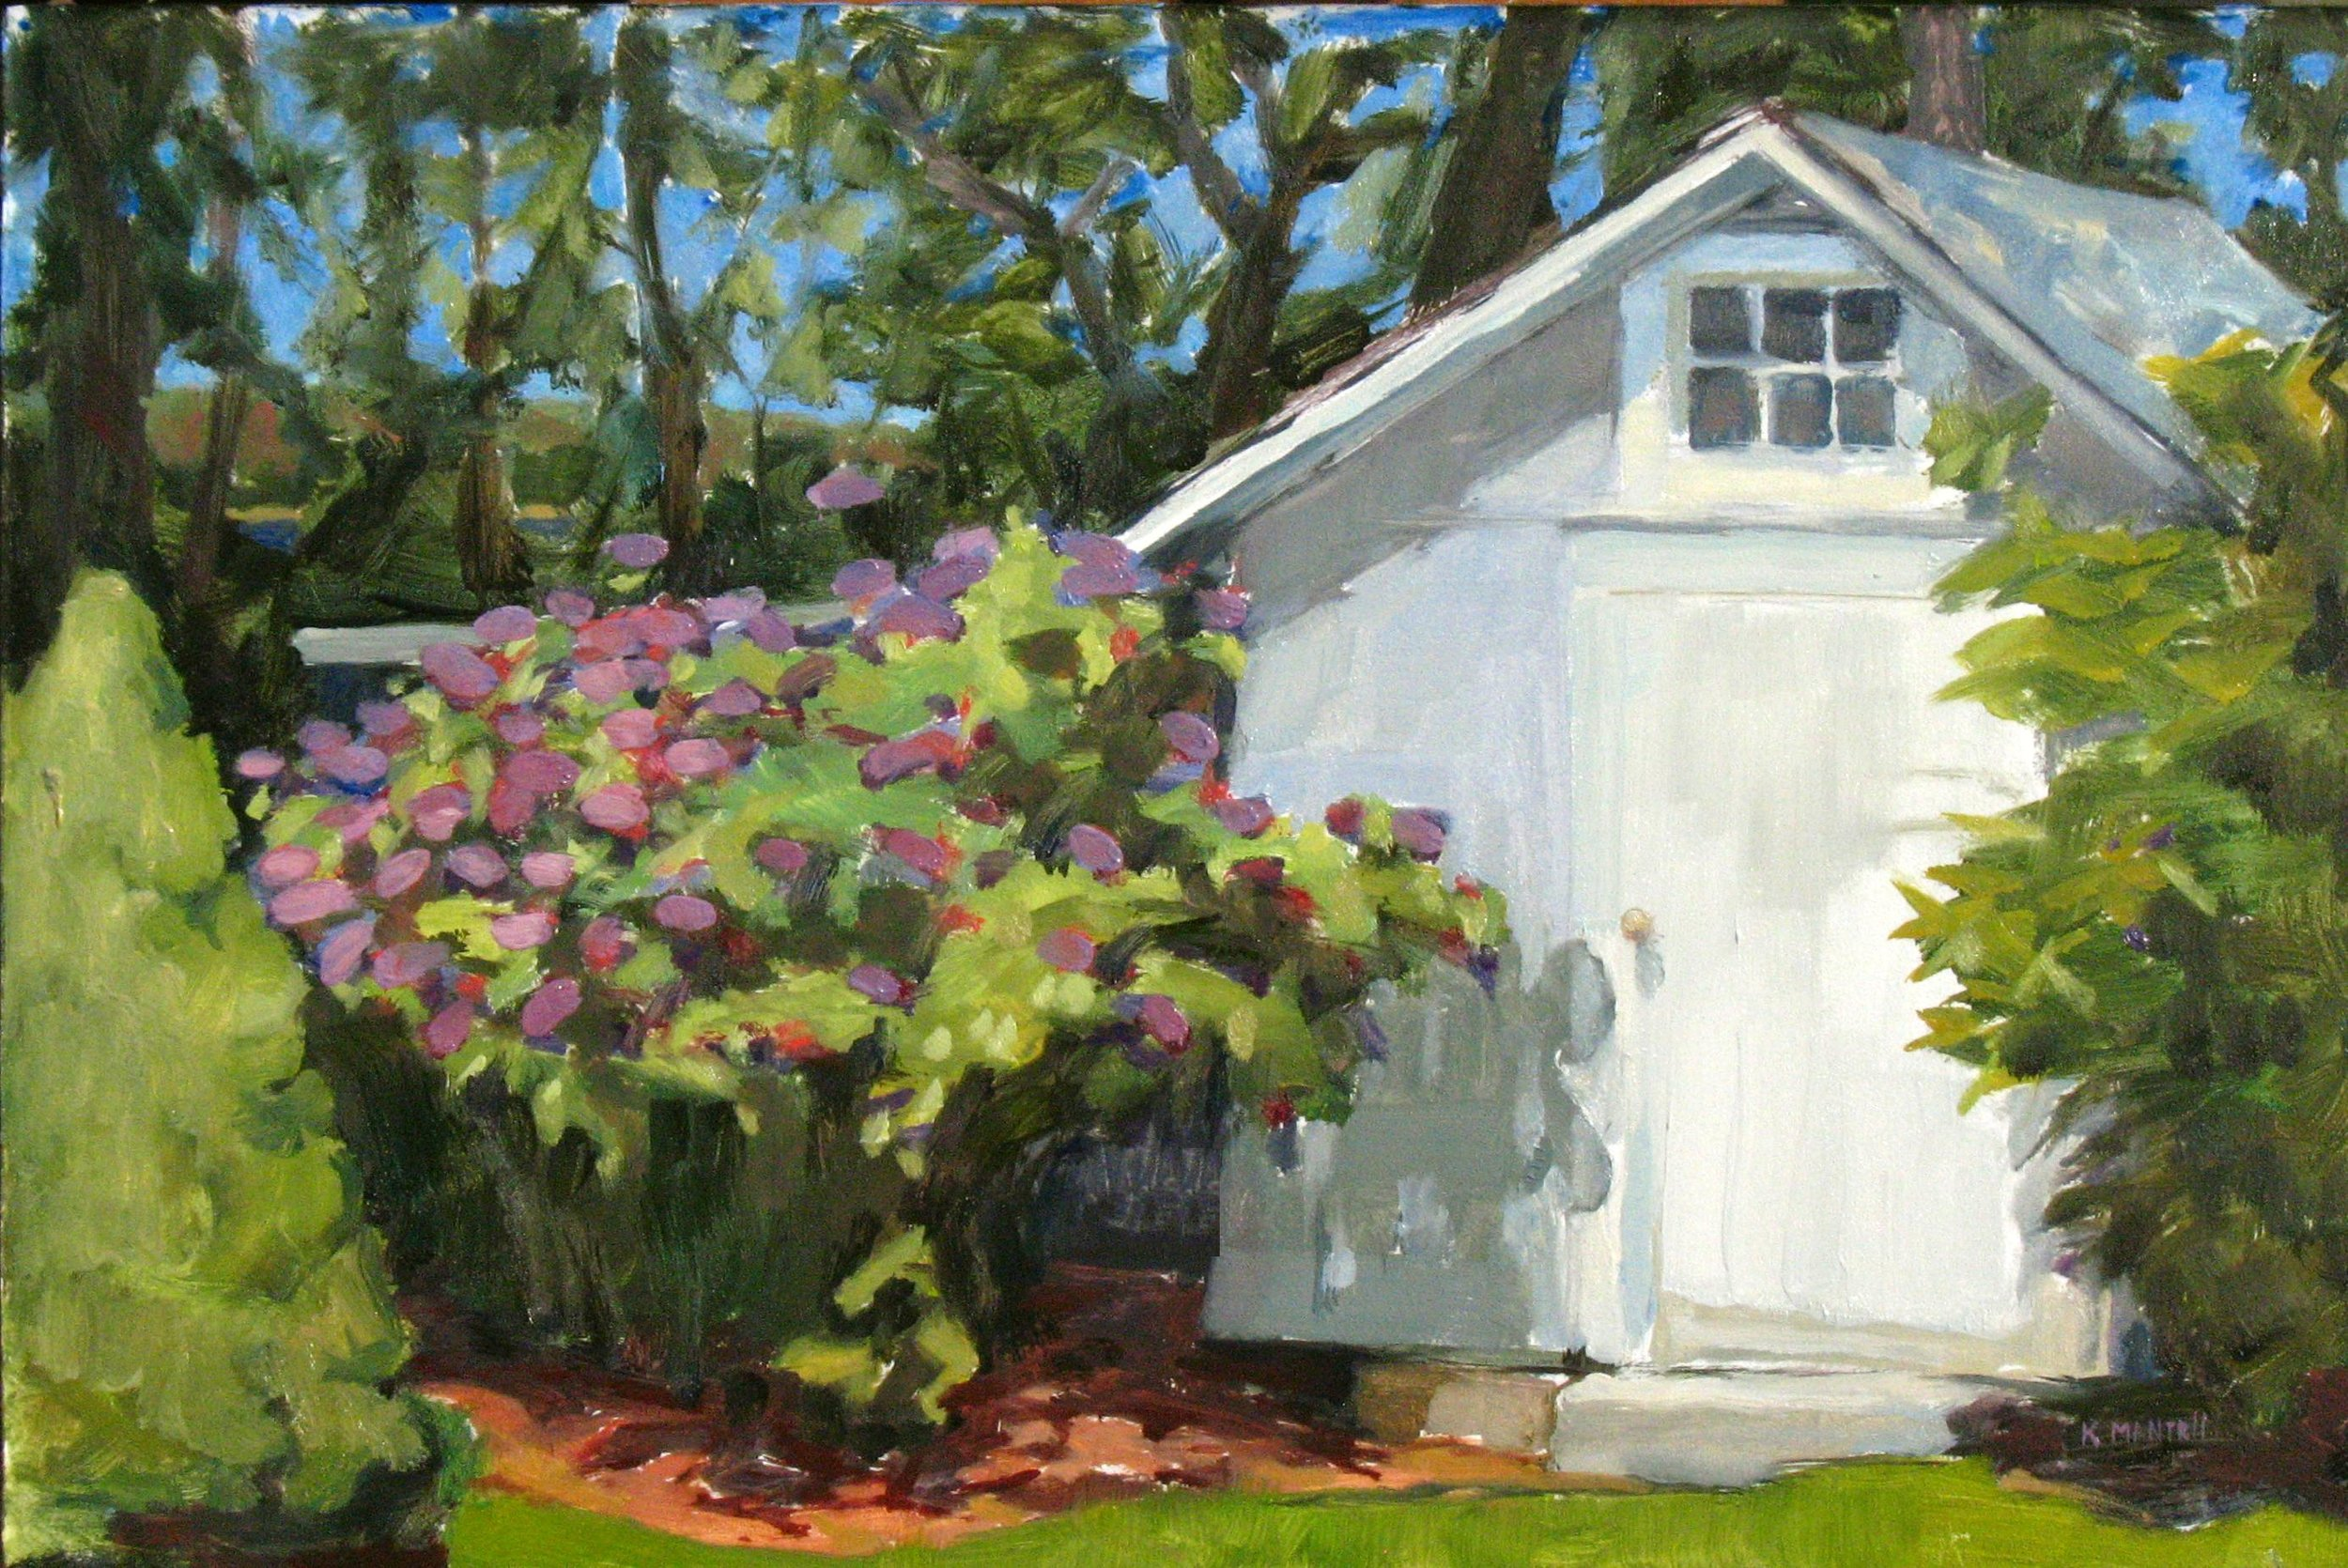 8x12 06 30 10 garden shed.jpg